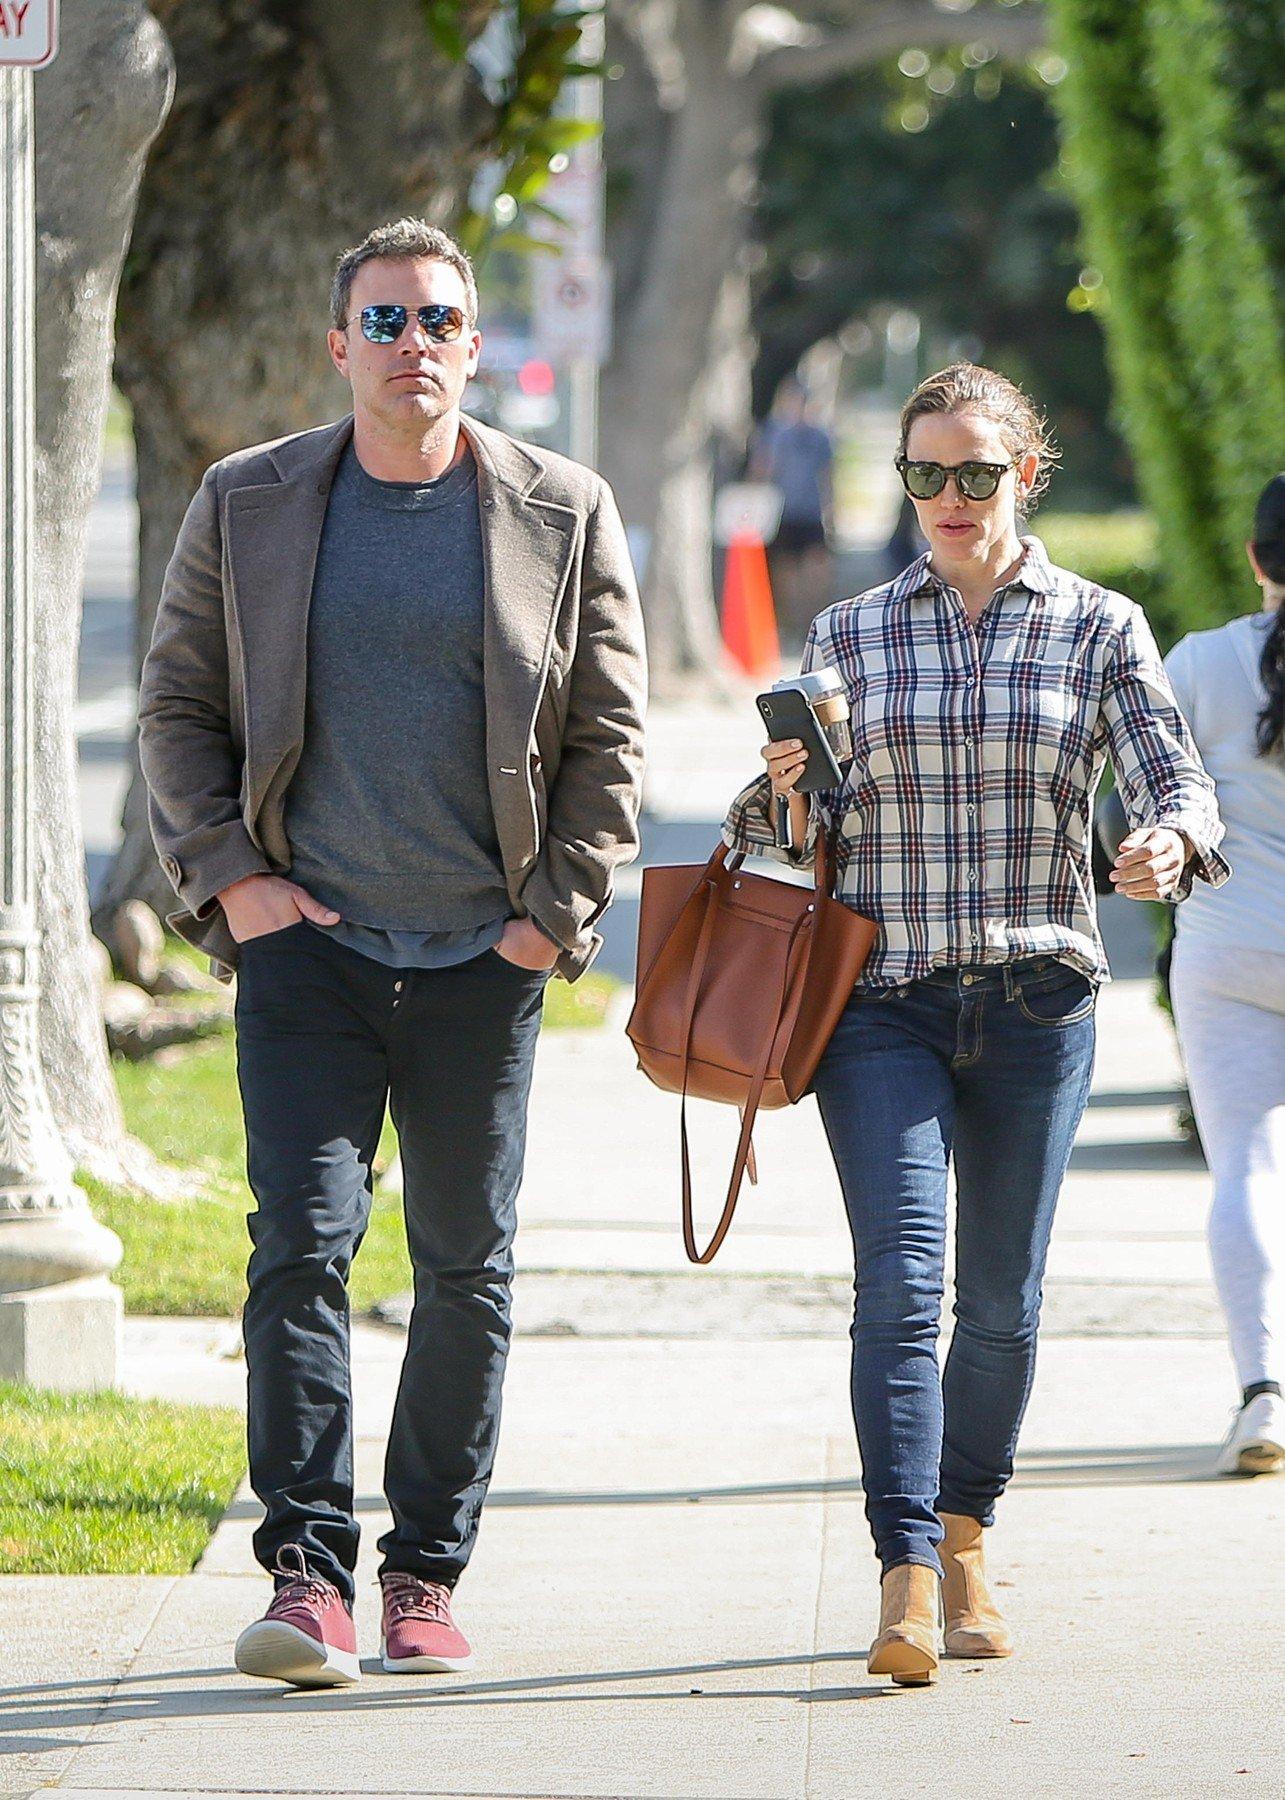 Ben Affleck and Jennifer Garner are seen in Los Angeles, California. 09 Apr 2019, Image: 425439926, License: Rights-managed, Restrictions: World Rights, Model Release: no, Credit line: Profimedia, Mega Agency